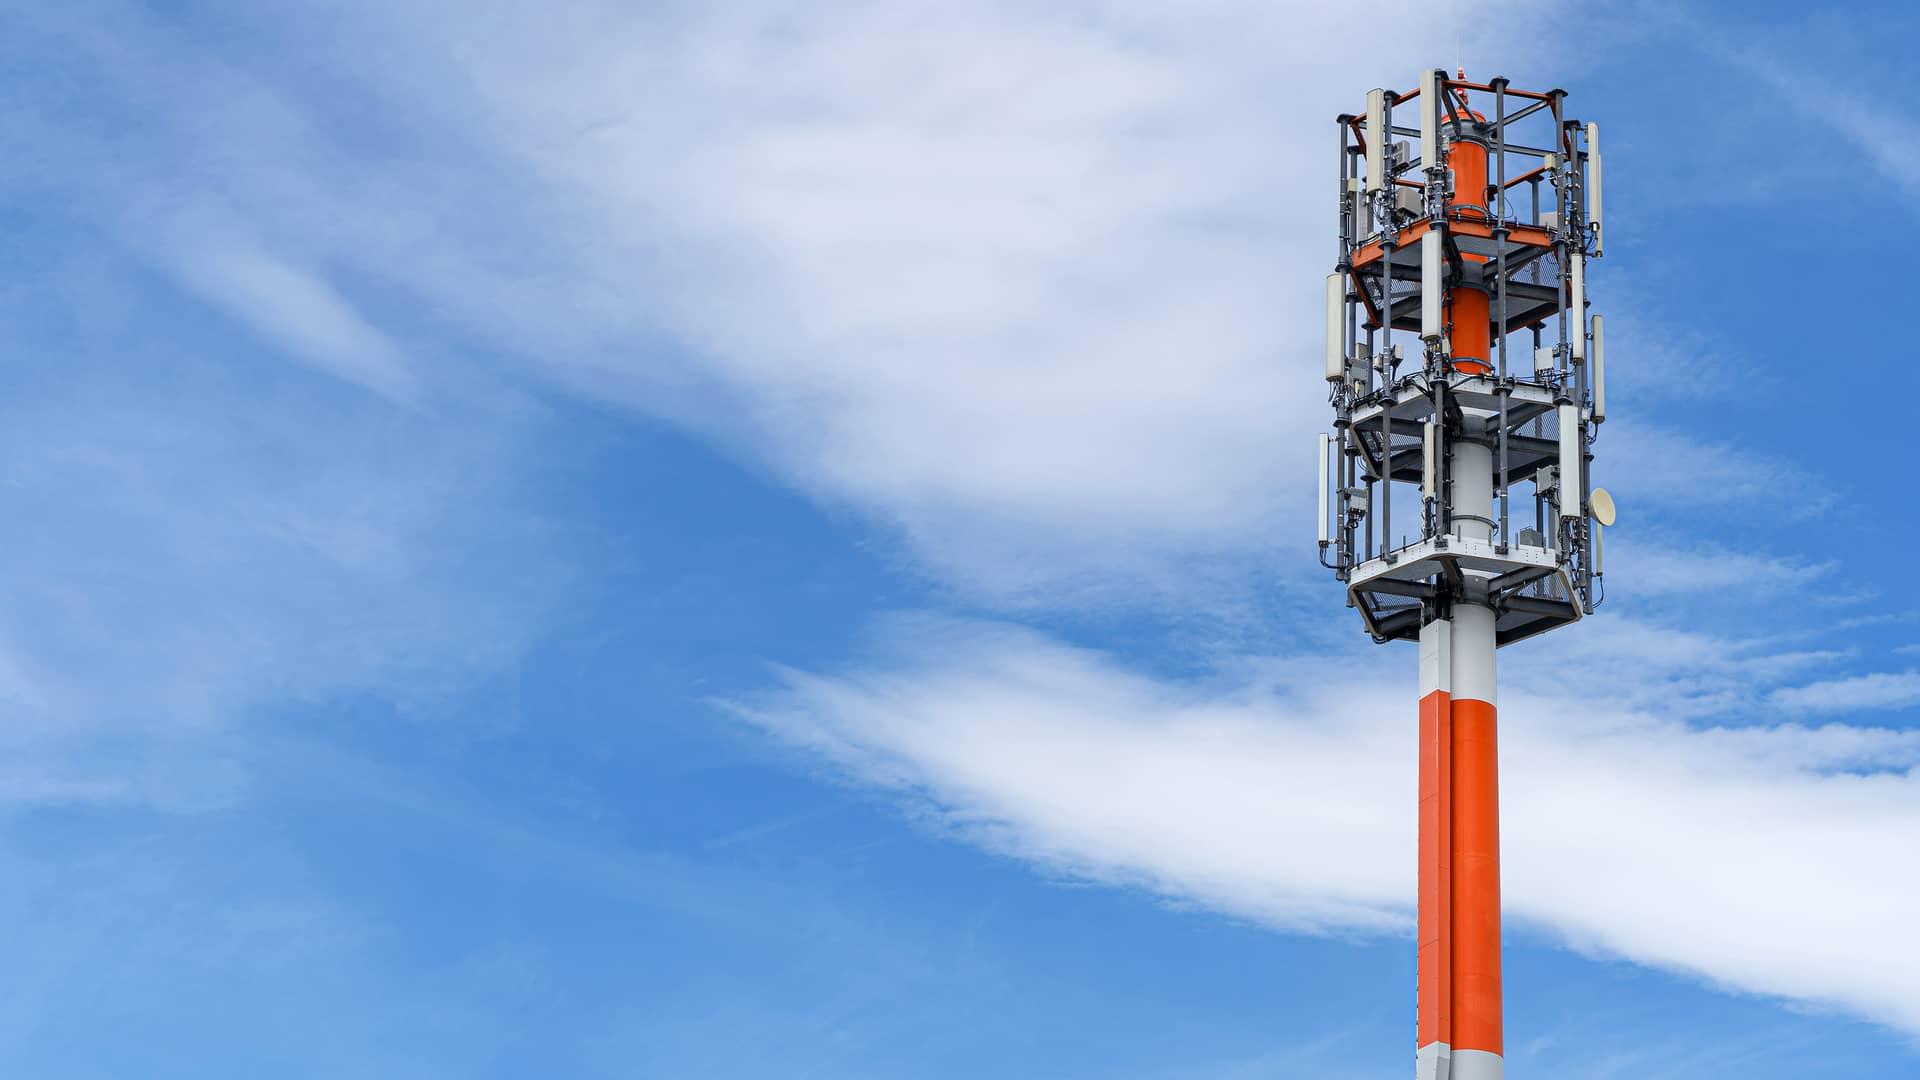 Antena telecomunicaciones representa cobertura de pepephone